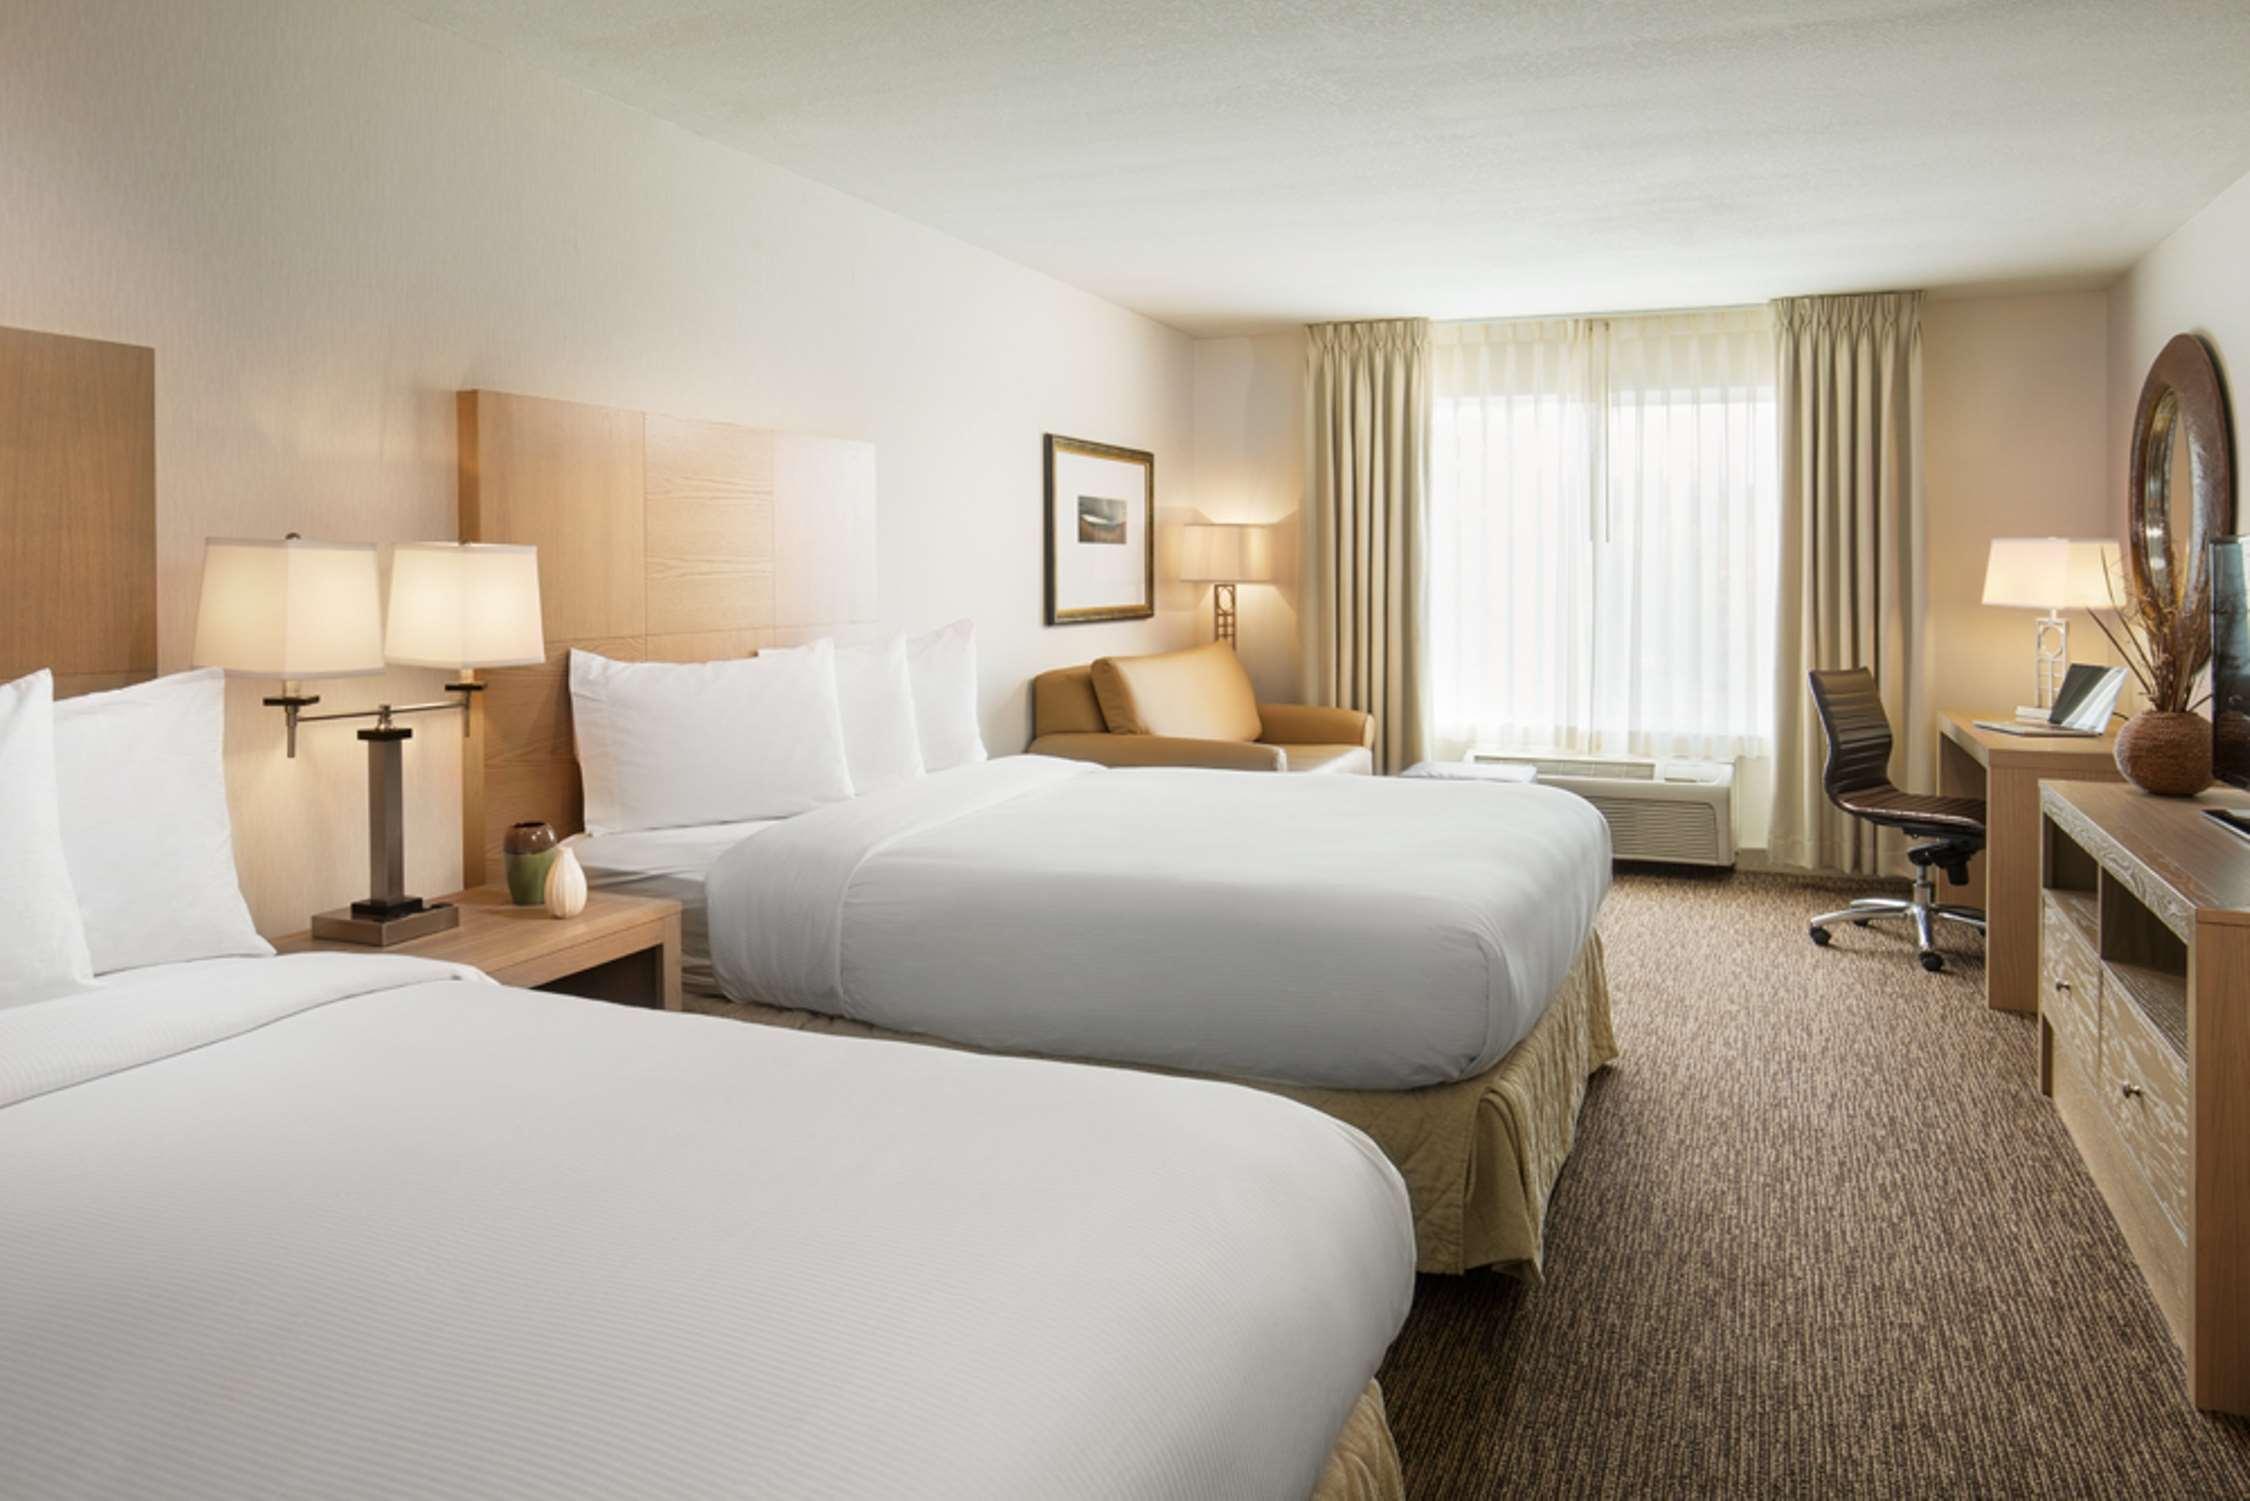 DoubleTree by Hilton Hotel Vancouver, Washington image 11